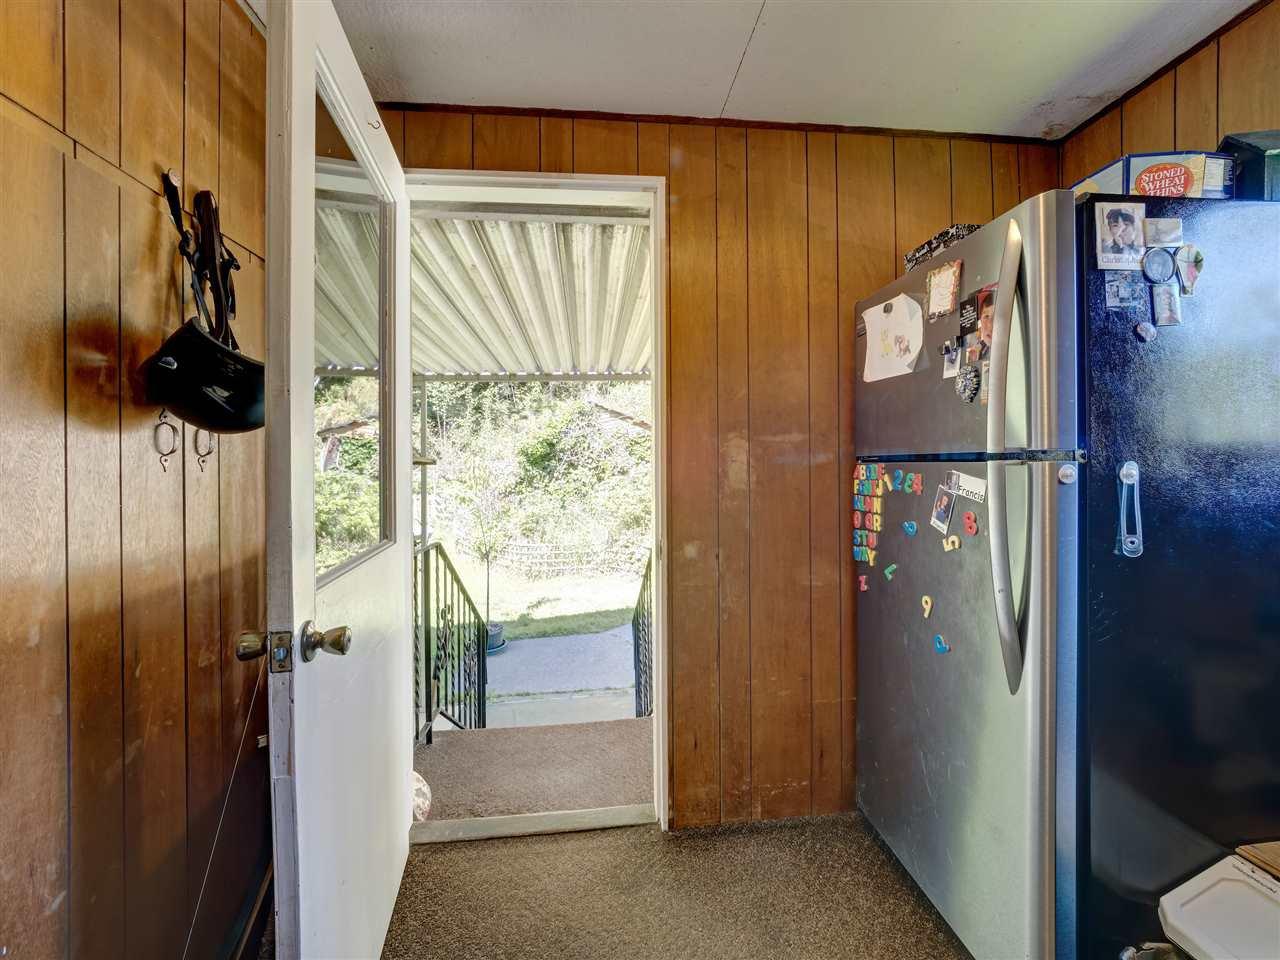 Photo 9: Photos: 5761 MCLAUGHAN Road in Sechelt: Sechelt District House for sale (Sunshine Coast)  : MLS®# R2479077